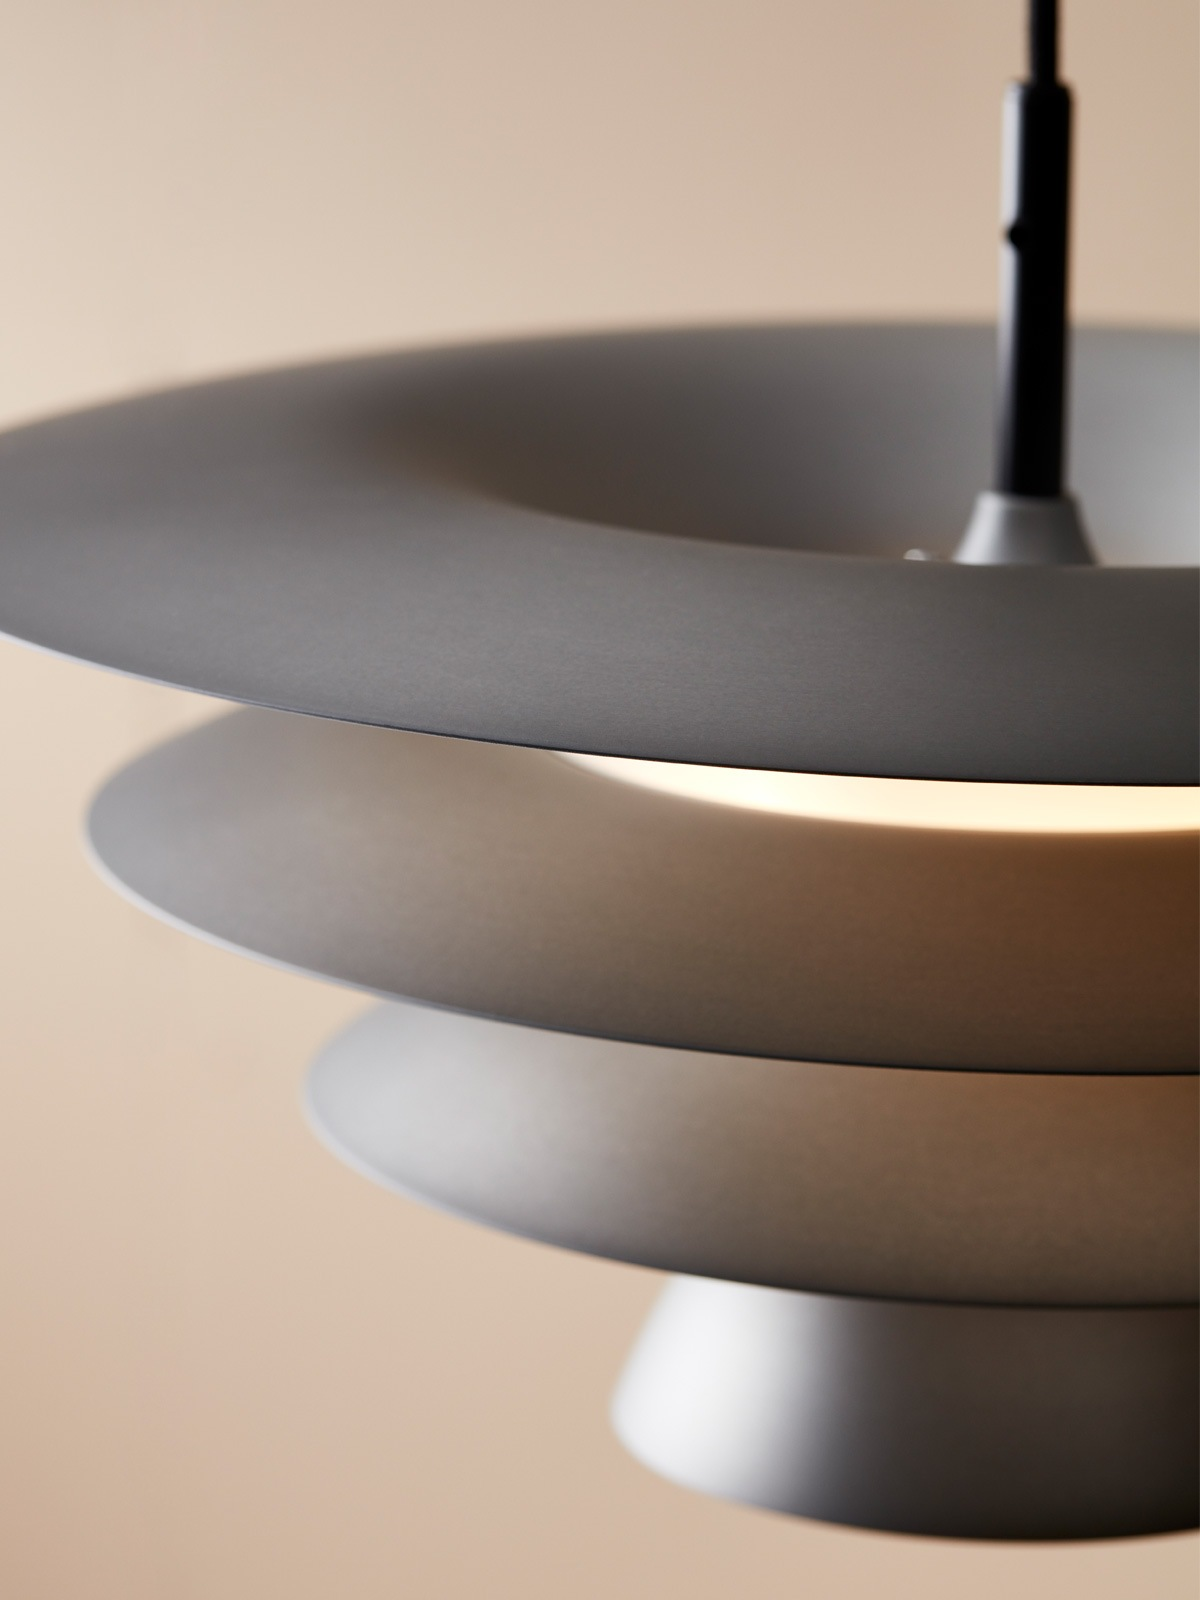 Belid DaVinci Lampe DesignOrt Onlineshop Berlin